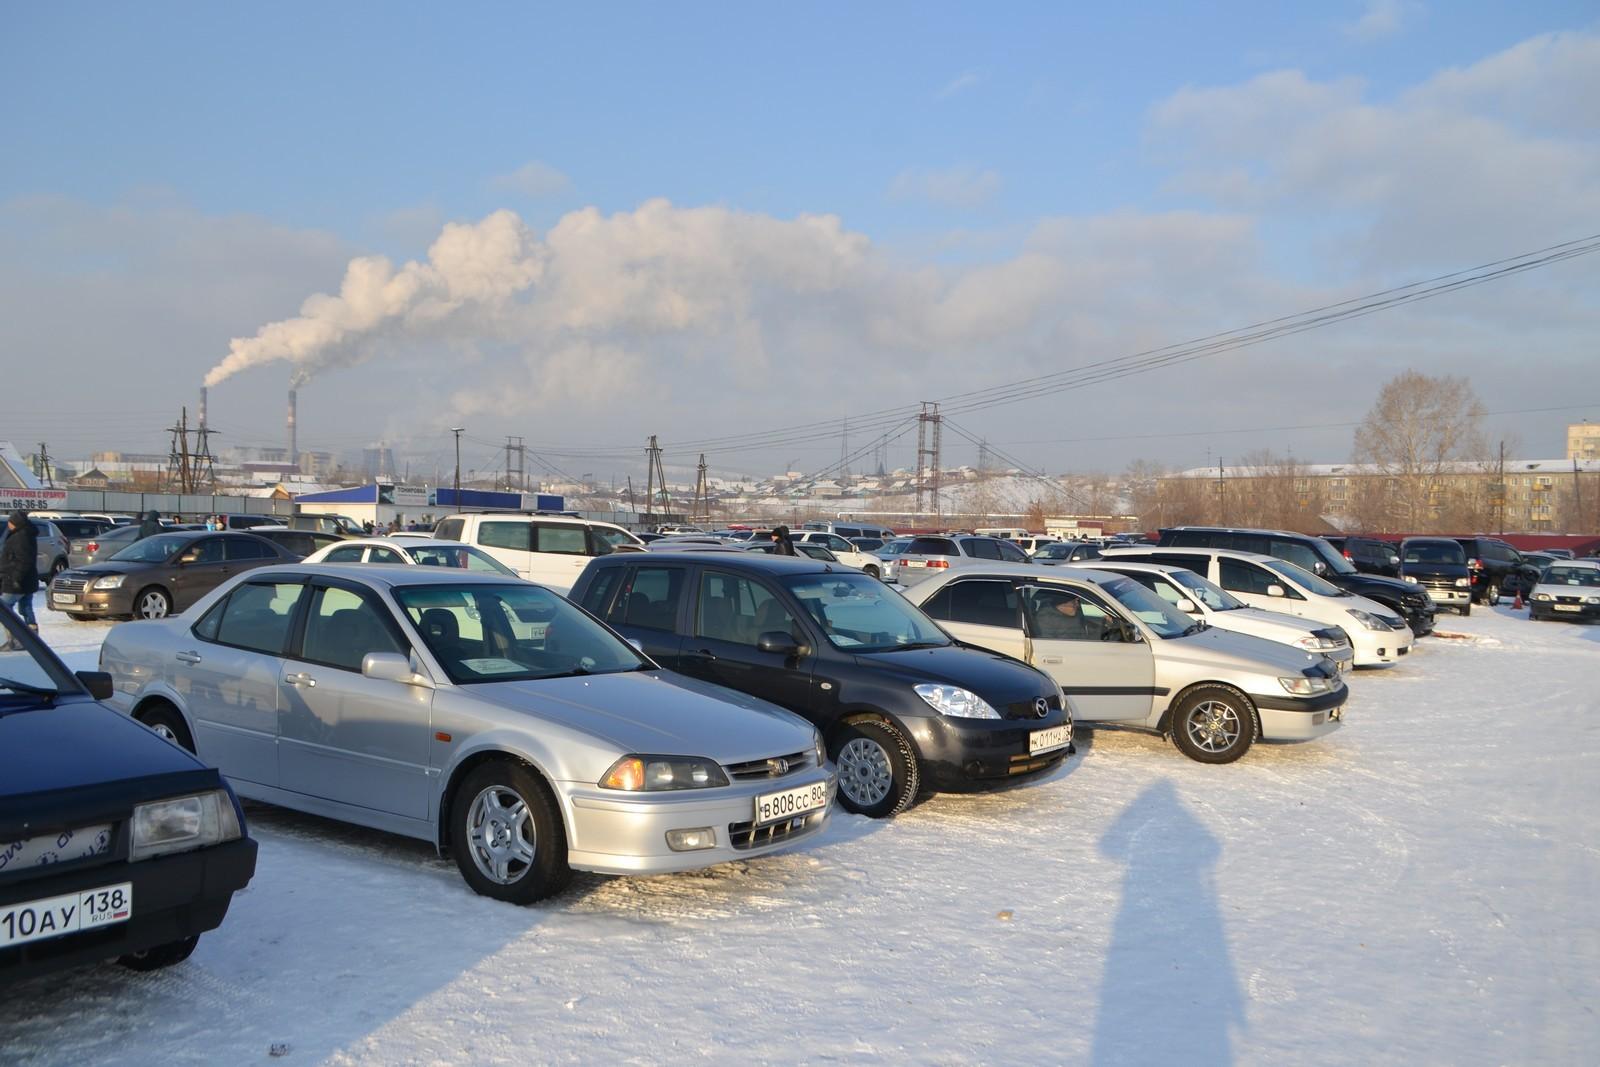 дром улан удэ российский автопром с фото сделана твердого пластика